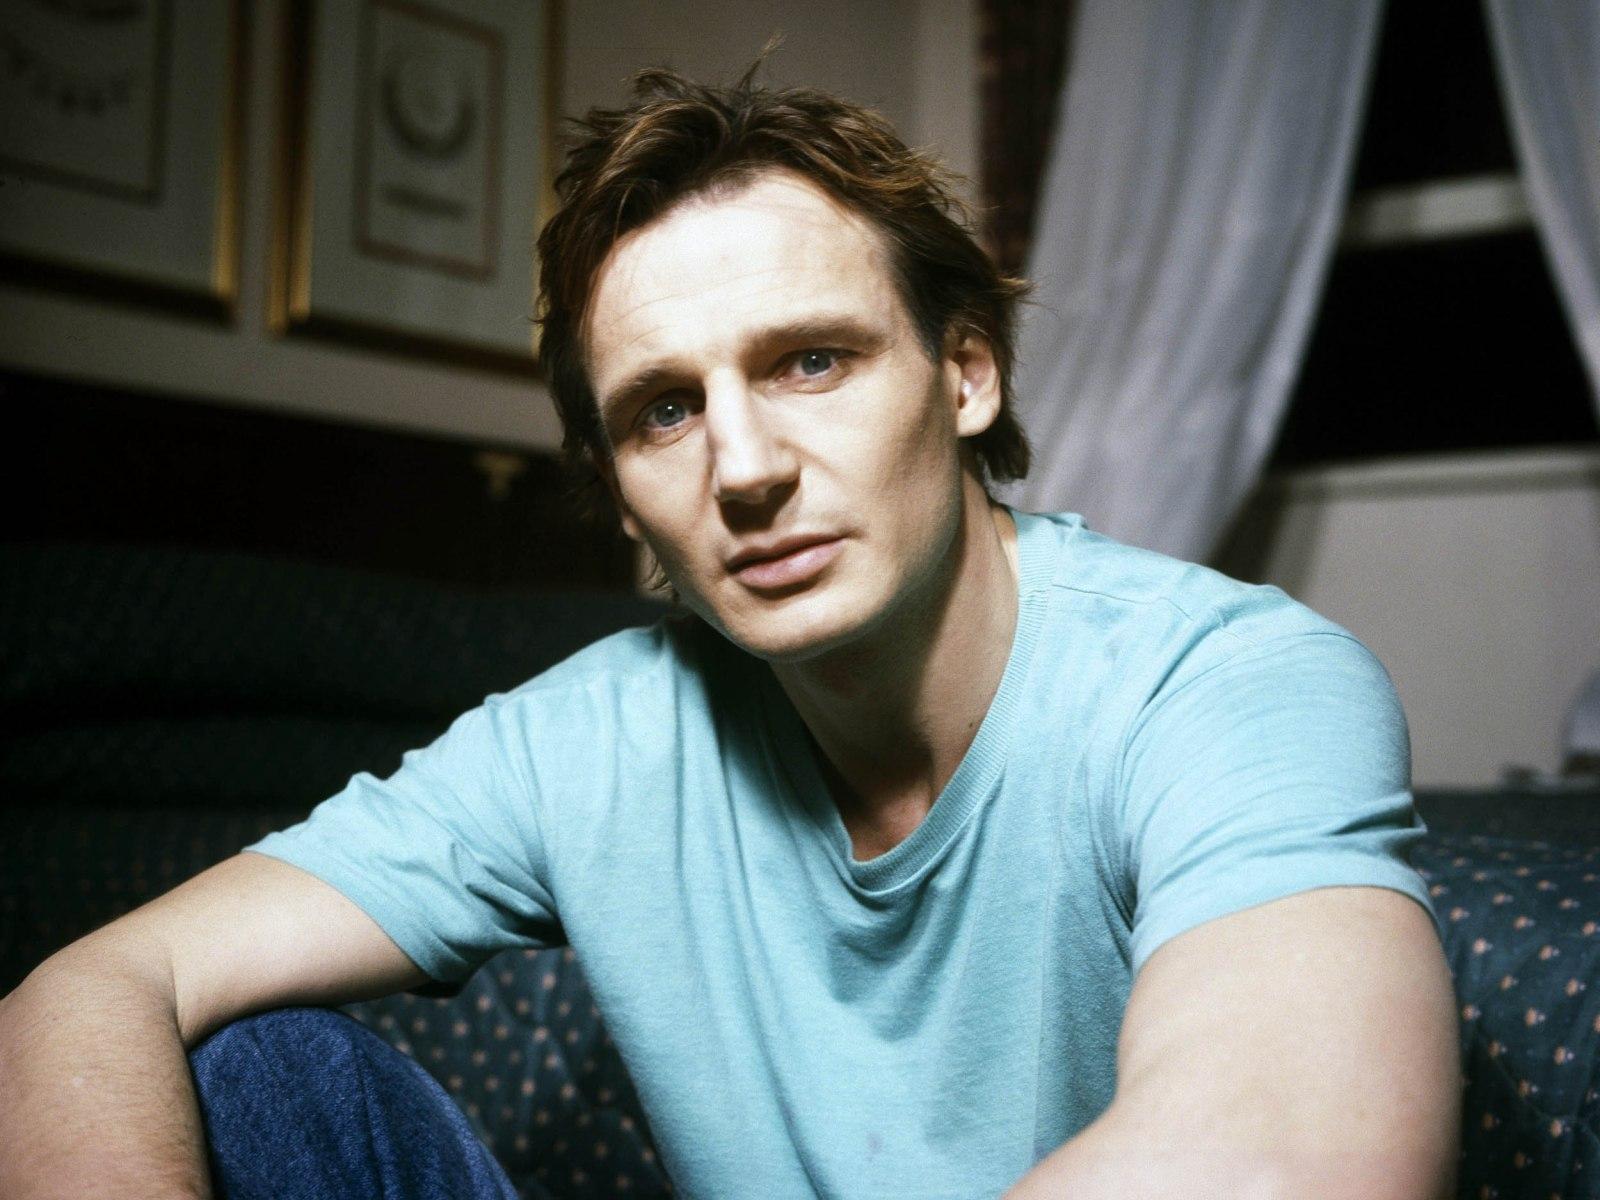 http://3.bp.blogspot.com/-wgBZiYN_PbI/T8QvPJUKFfI/AAAAAAAAAKY/YeQEll9l_A8/s1600/Liam+Neeson.jpg